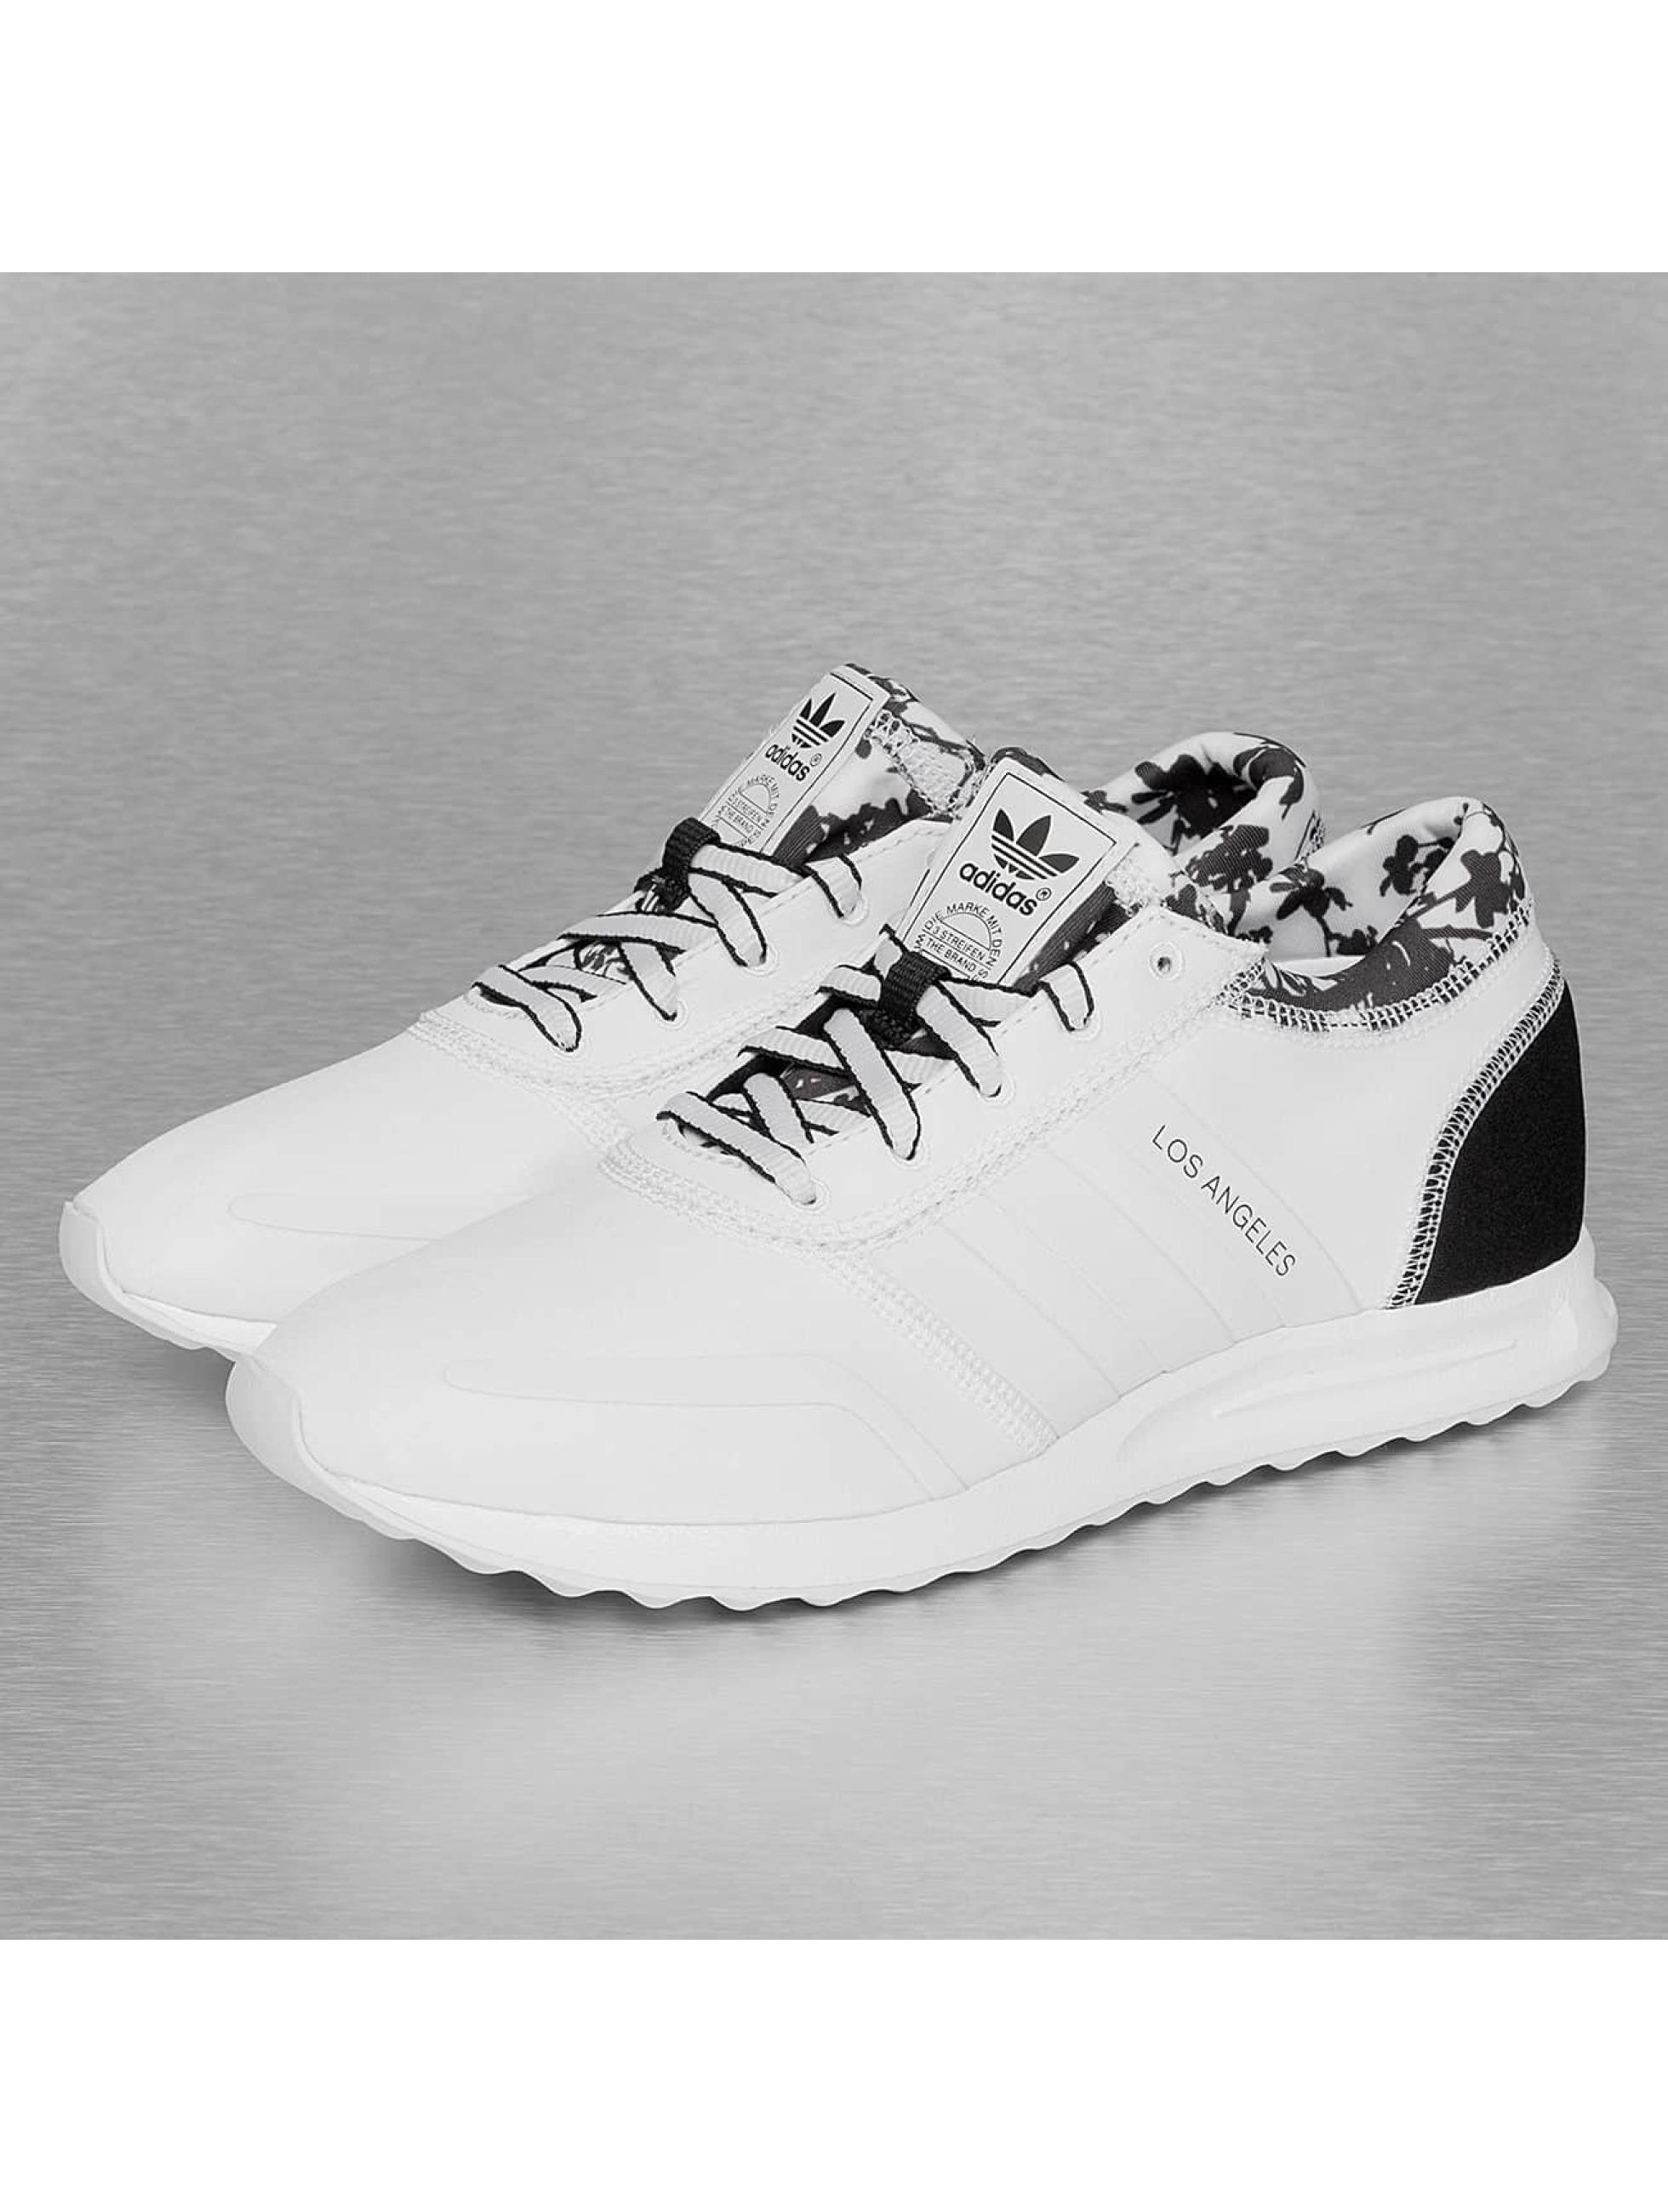 adidas - baskets los angeles noir blanc